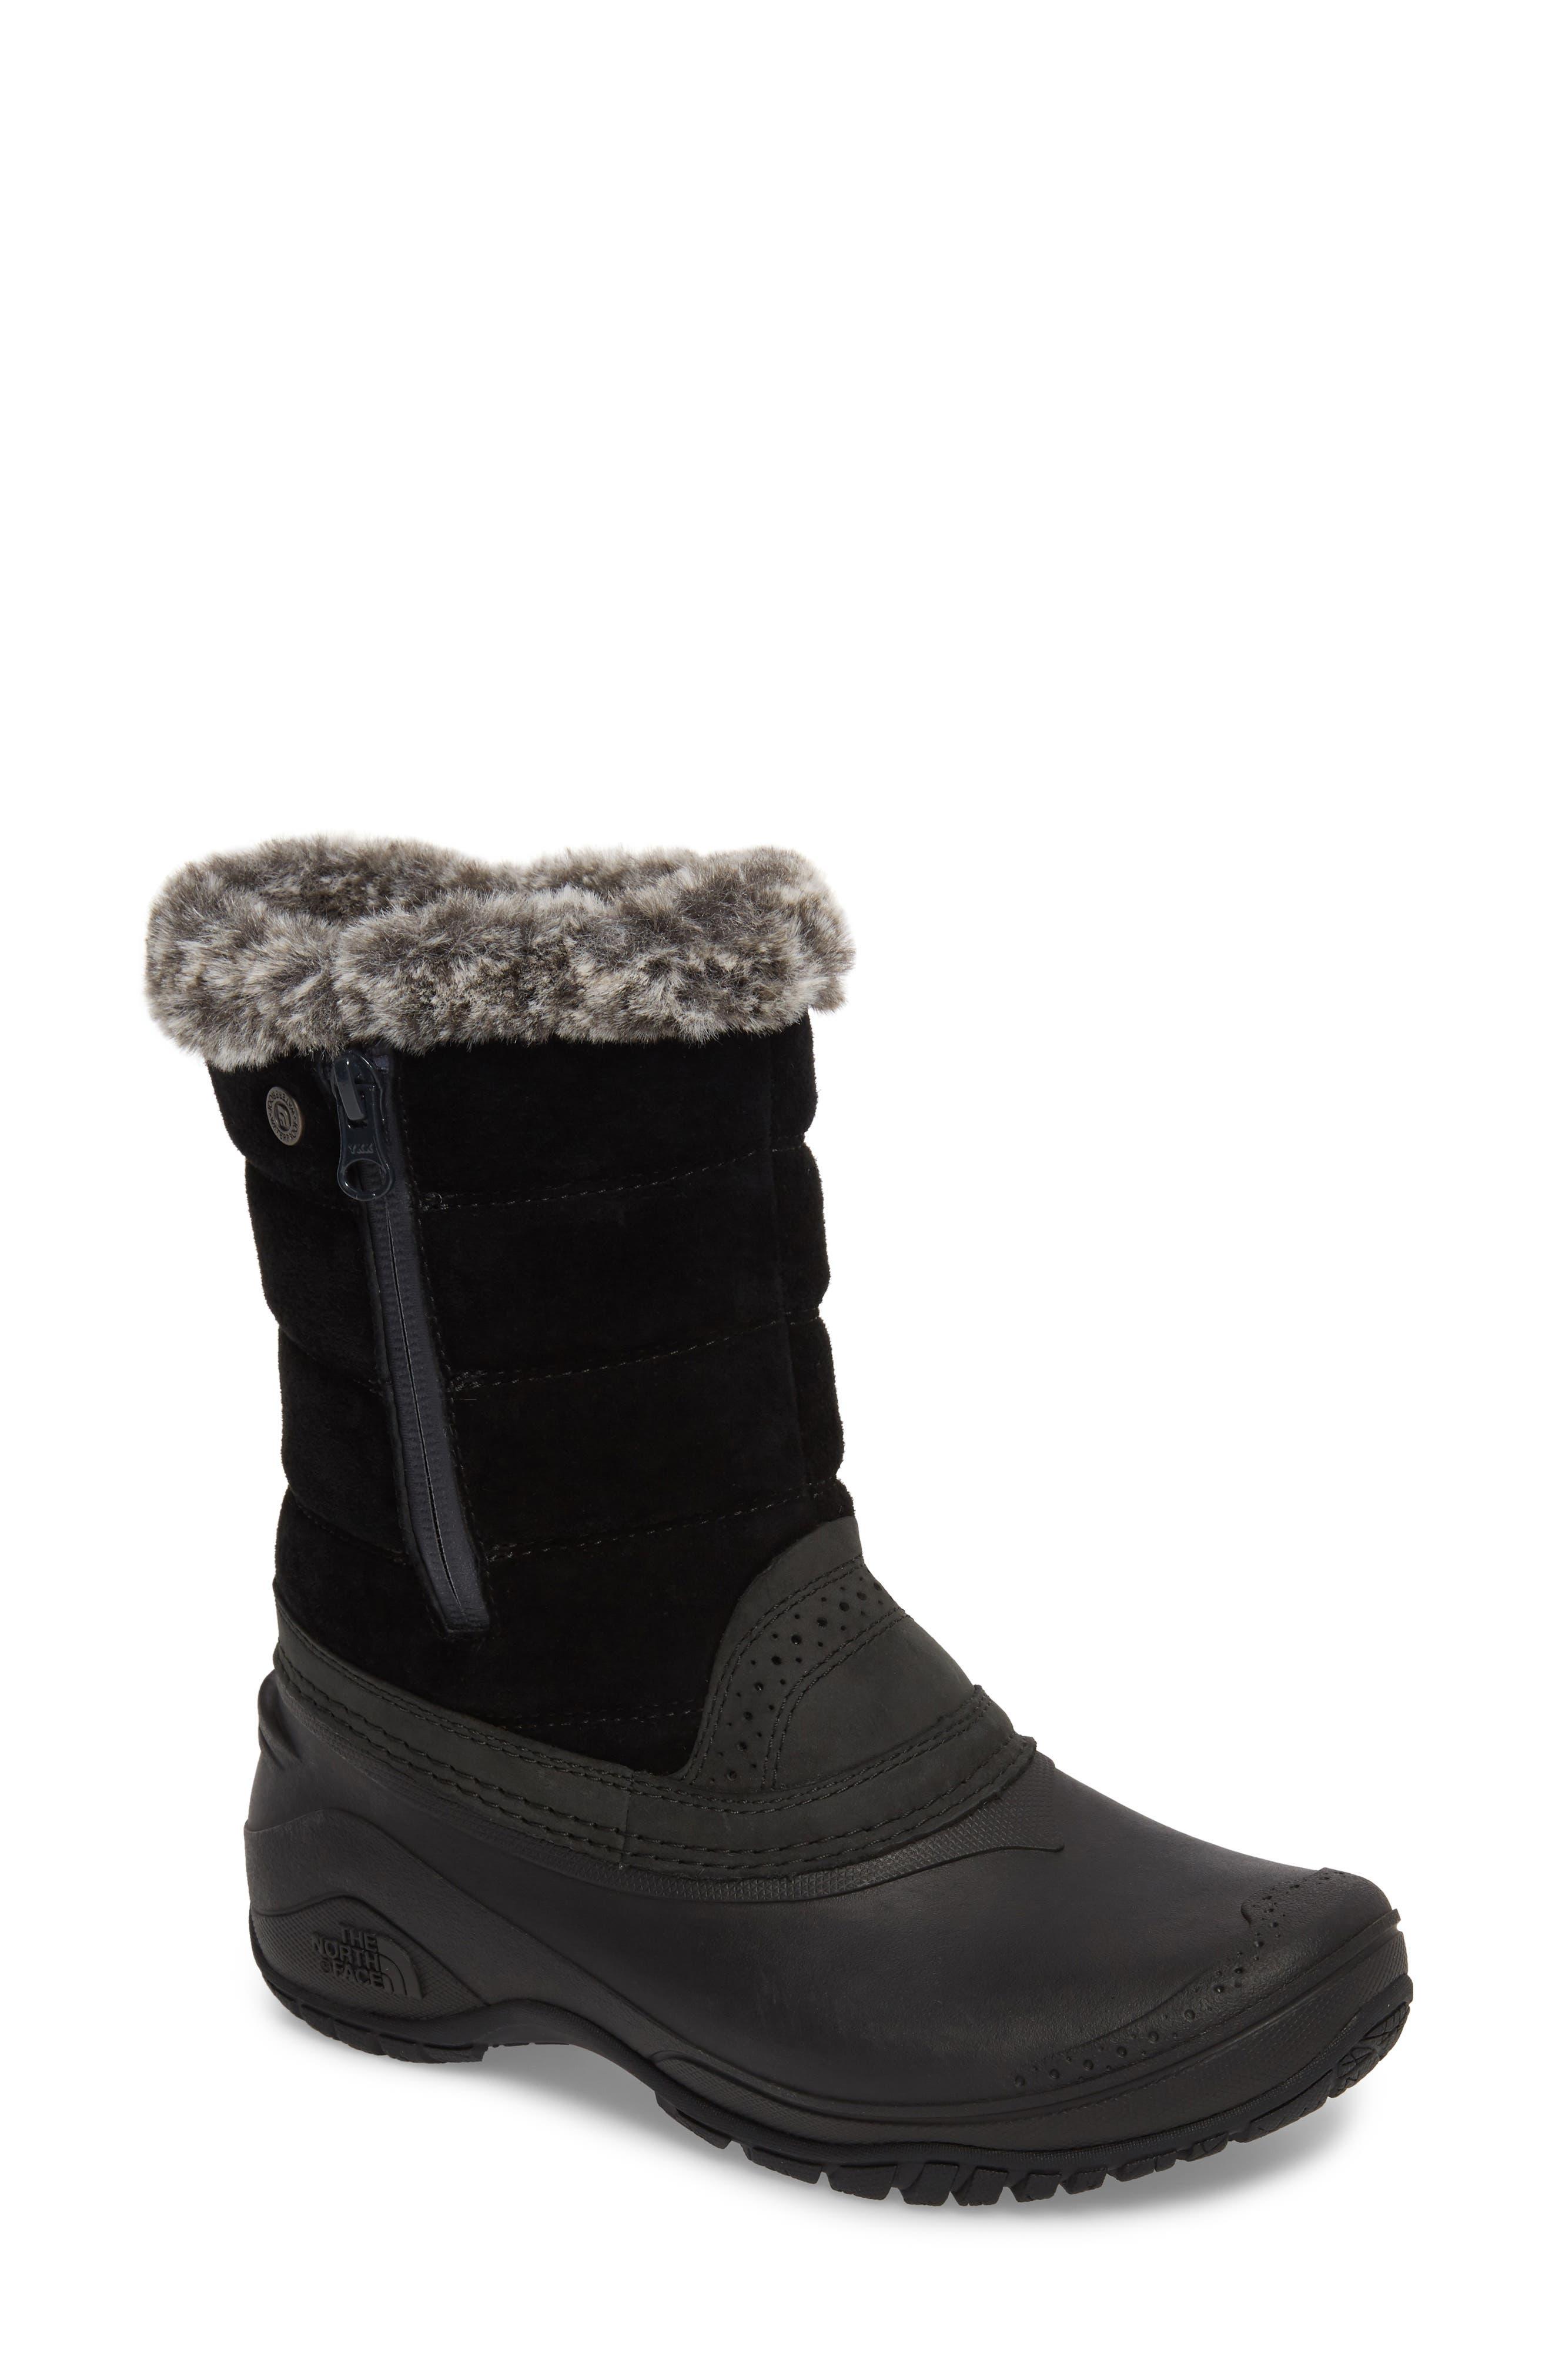 Shellista III Waterproof Pull-On Snow Boot,                         Main,                         color, Tnf Black